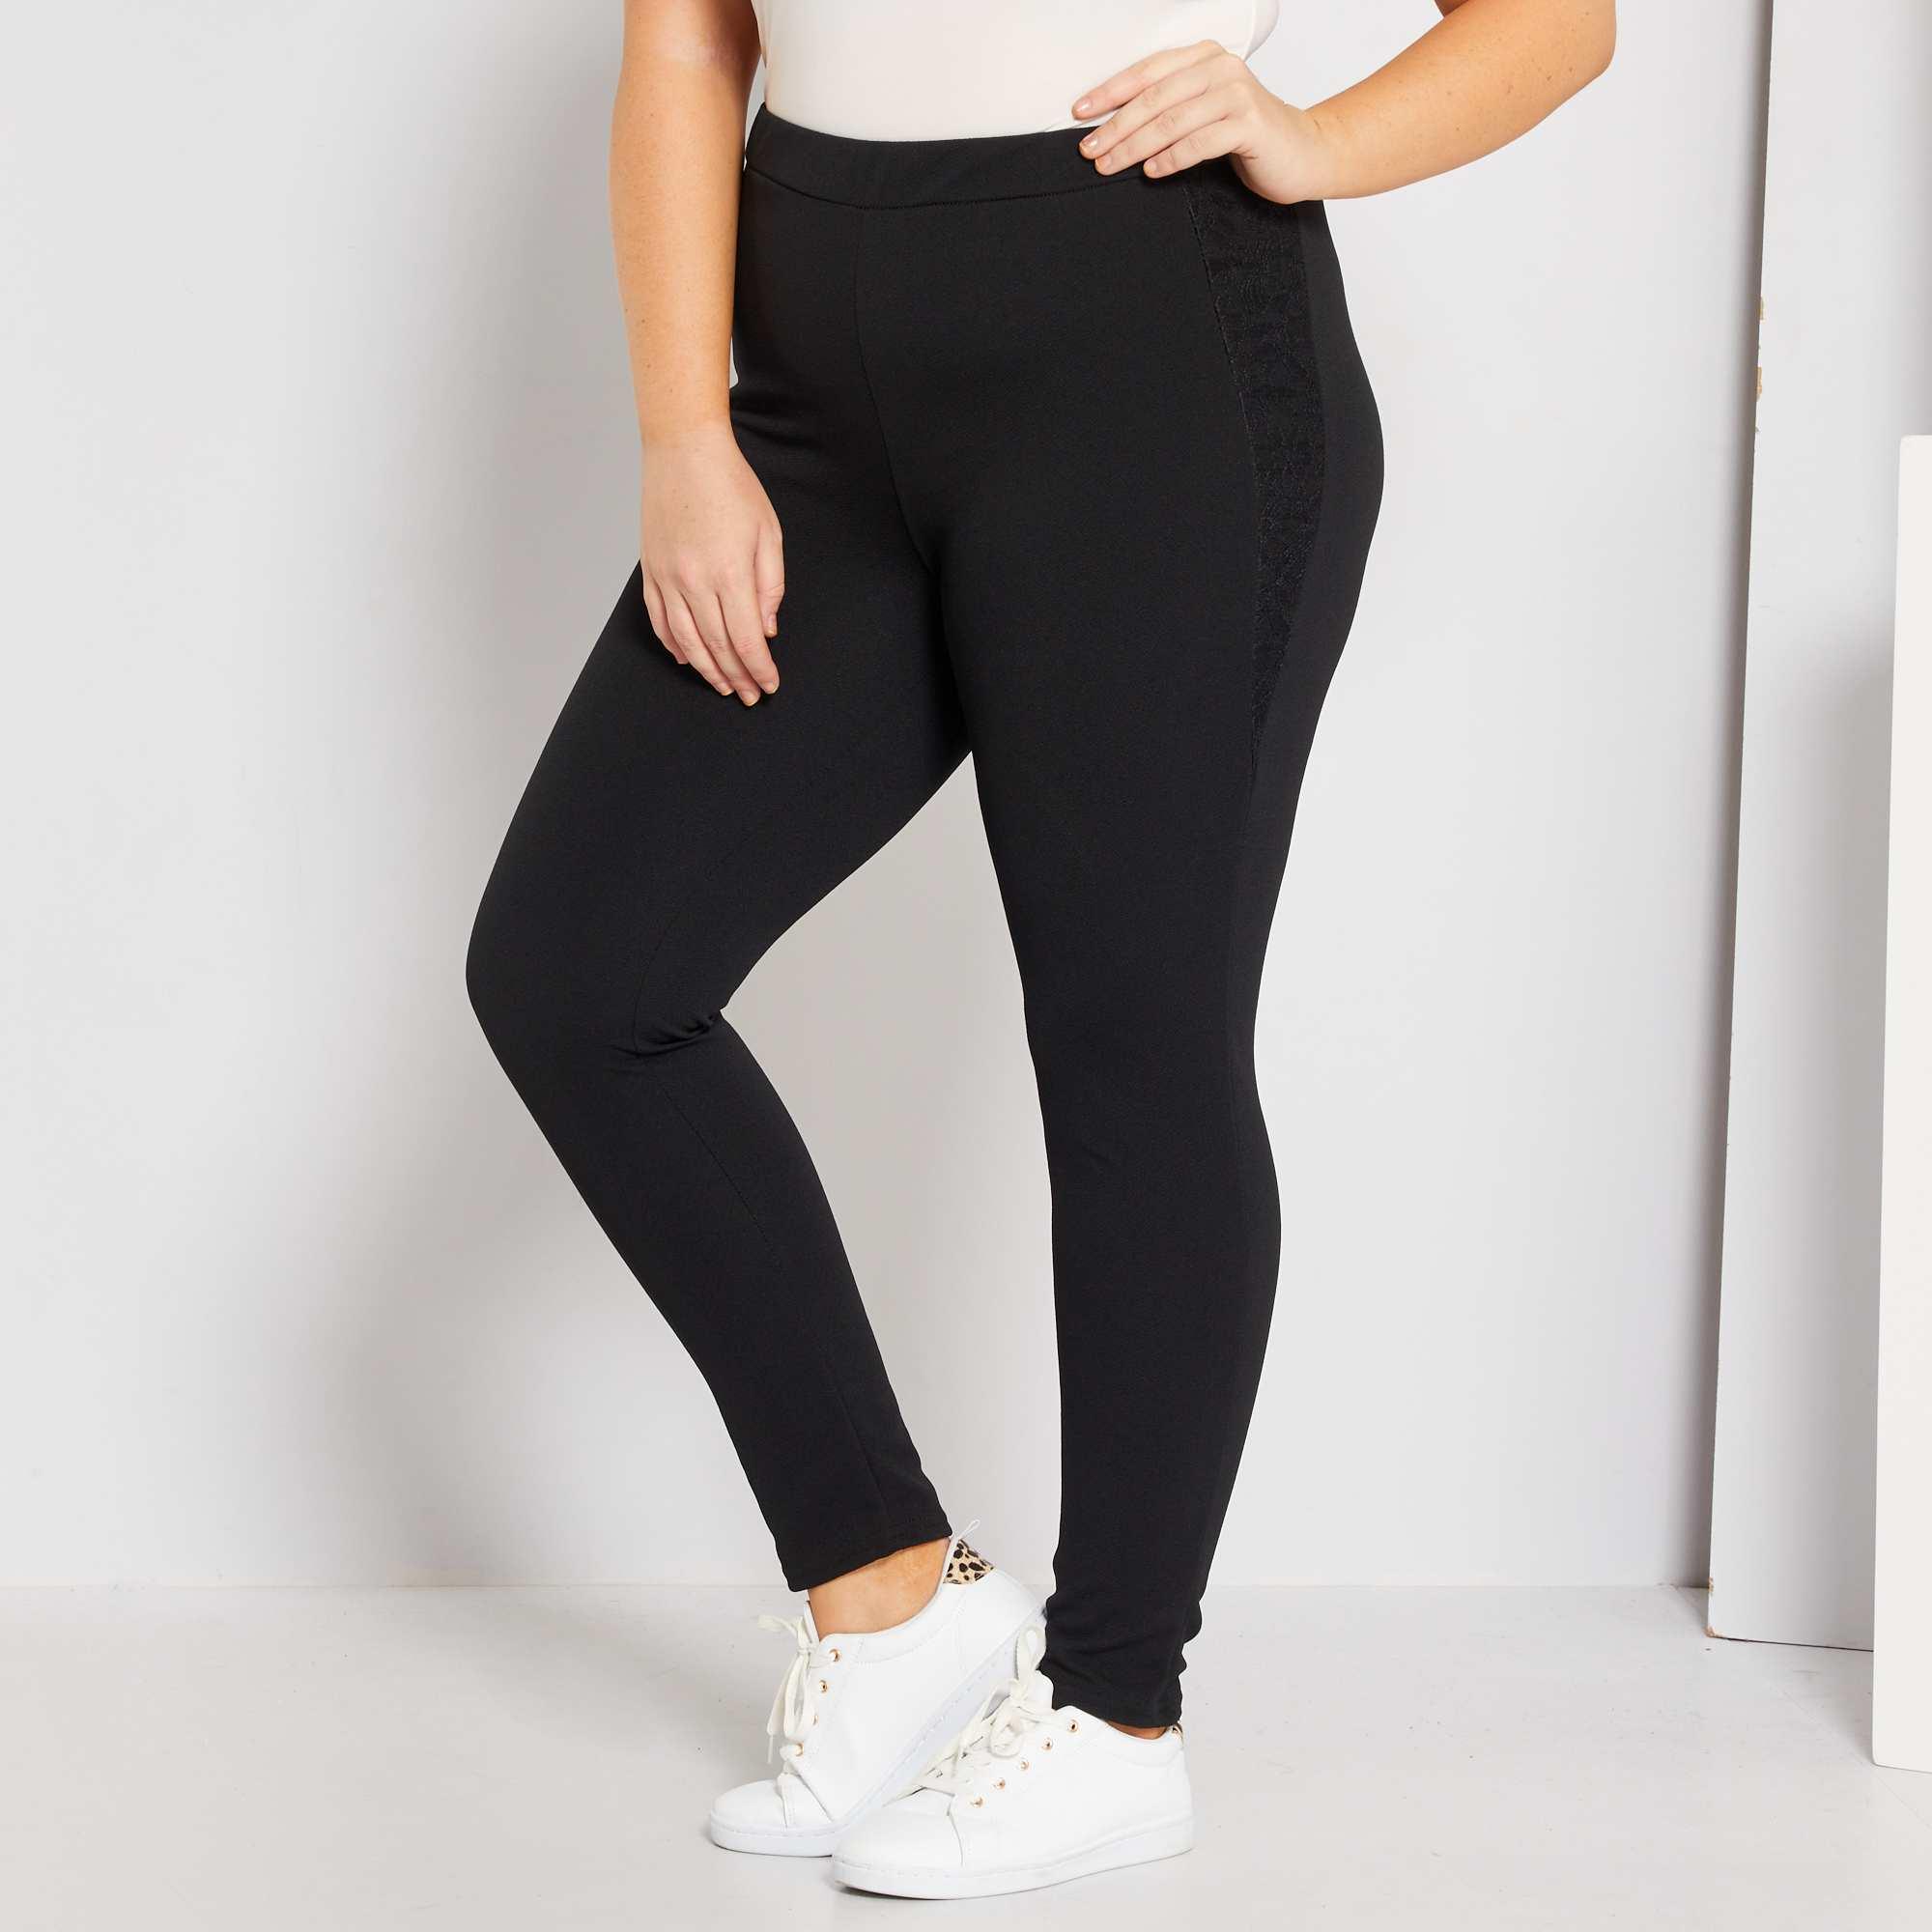 pantalon en cr pe avec dentelle grande taille femme noir. Black Bedroom Furniture Sets. Home Design Ideas